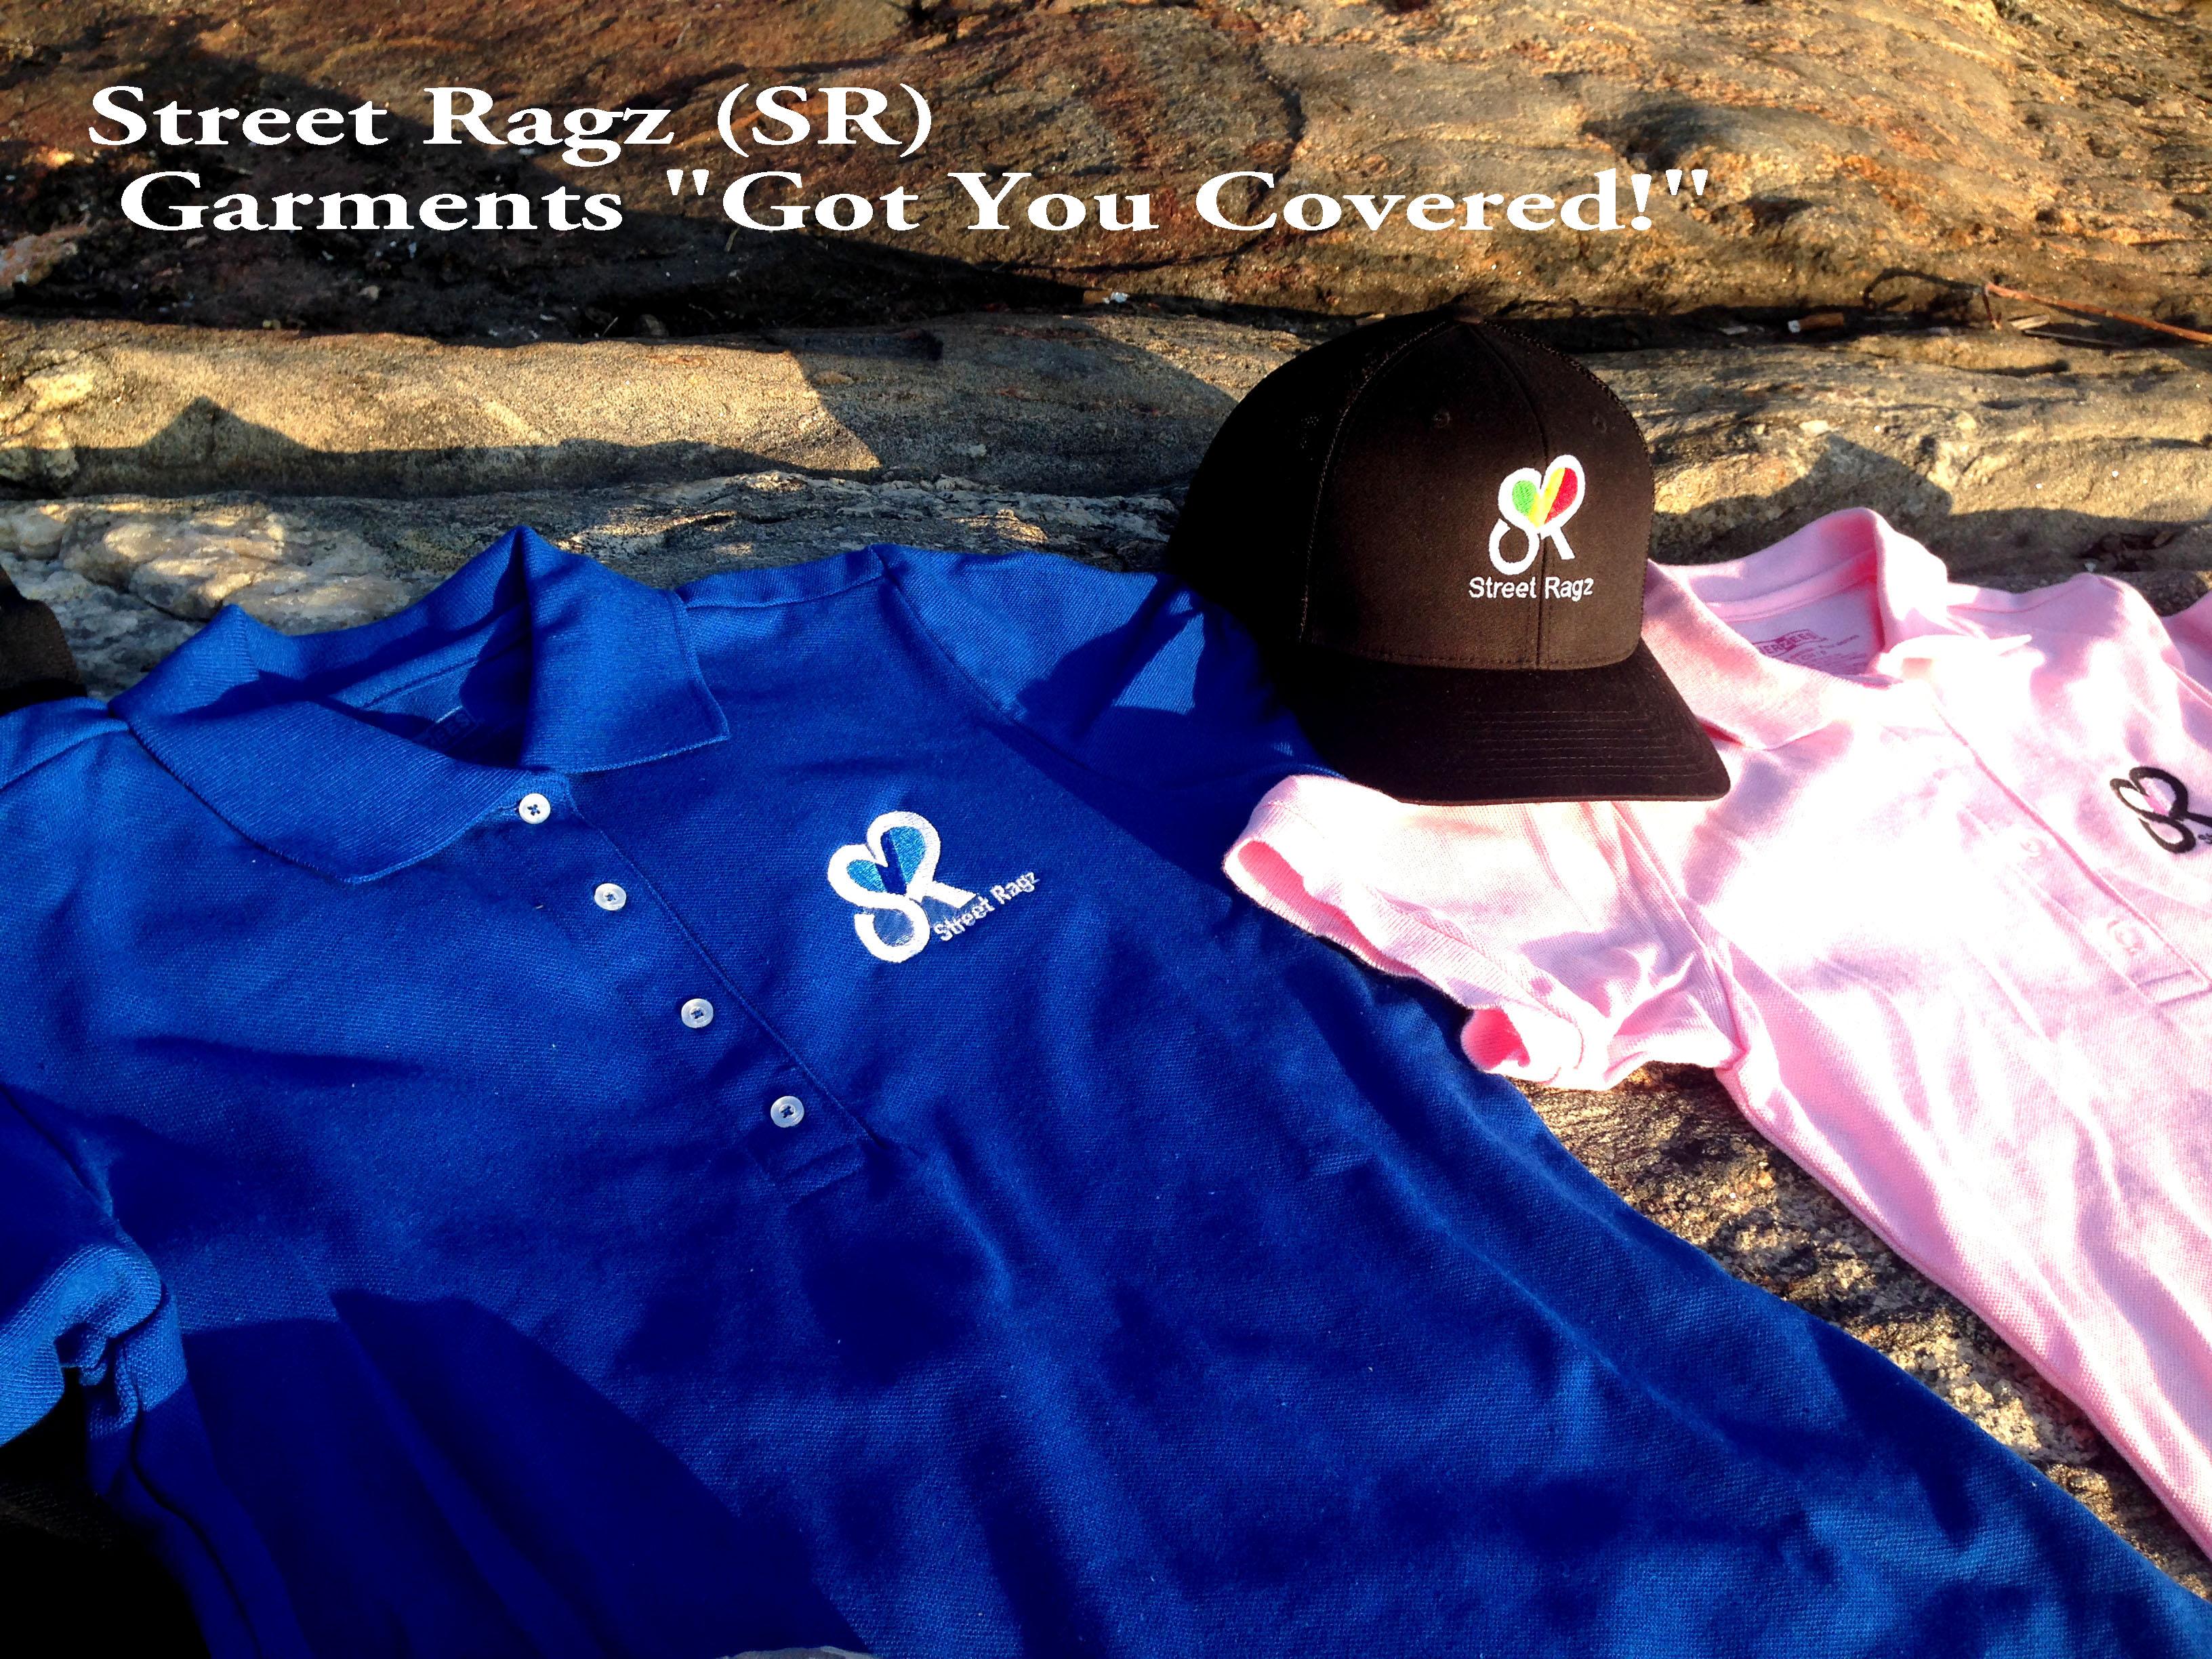 Street Ragz (SR) Garments